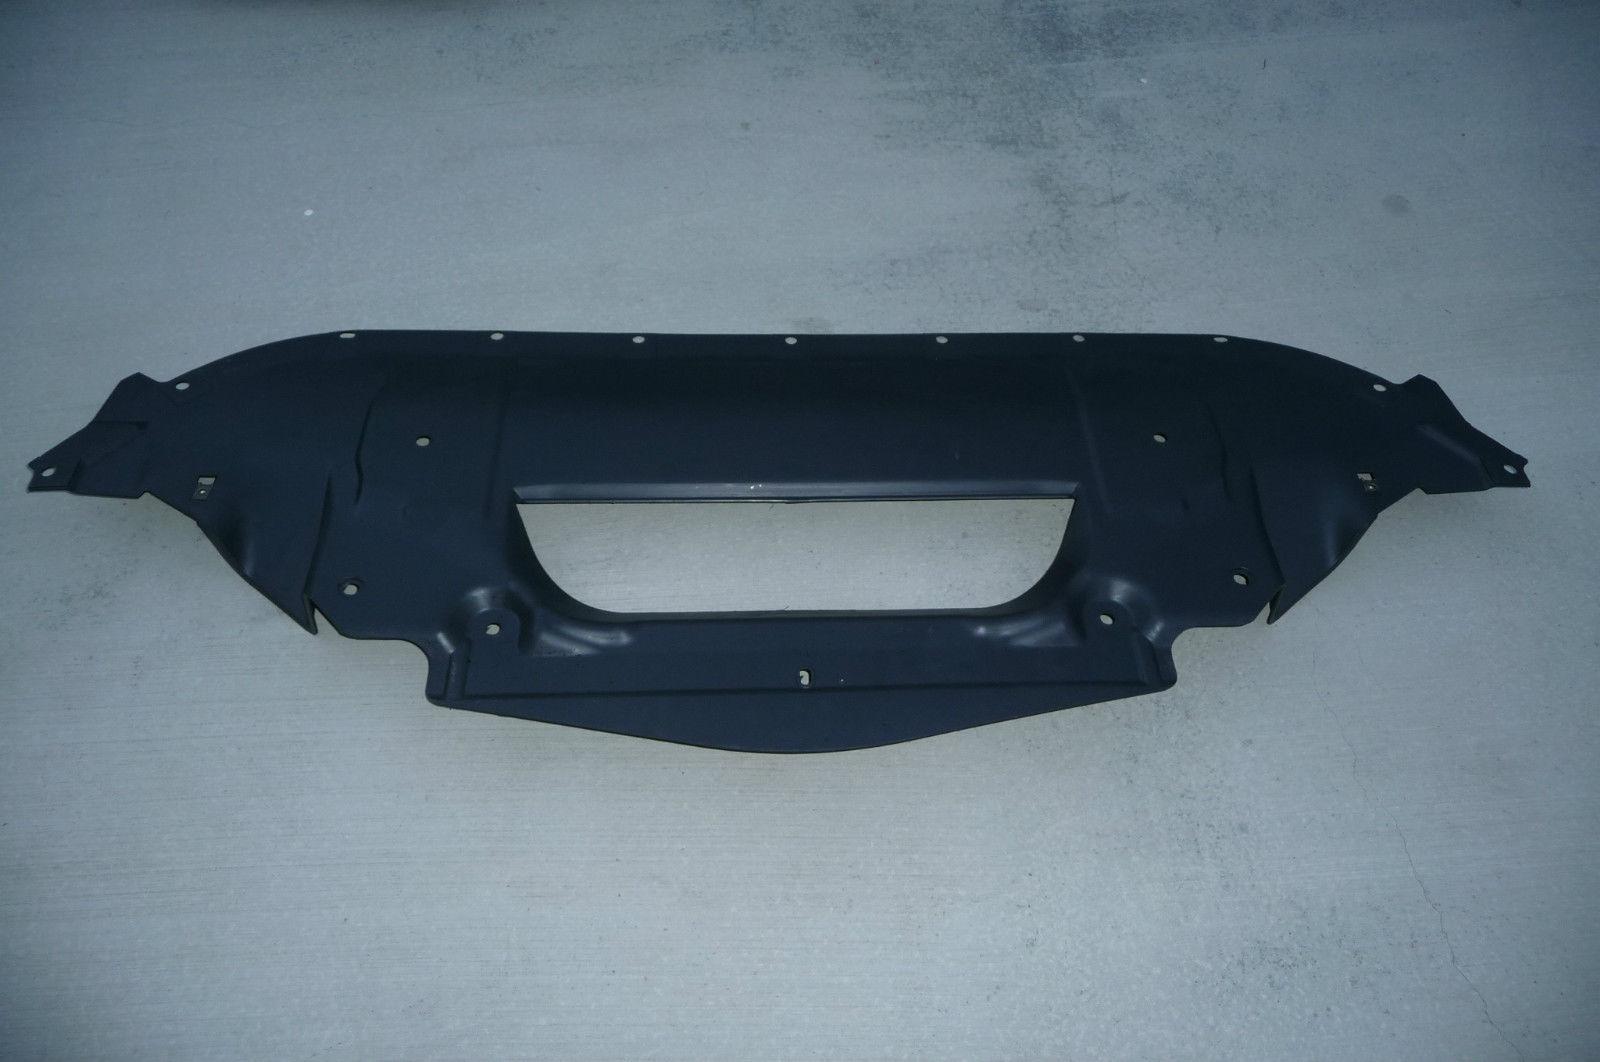 Maserati GranTurismo Front Aerodynamic Shield 80156100 OEM OE